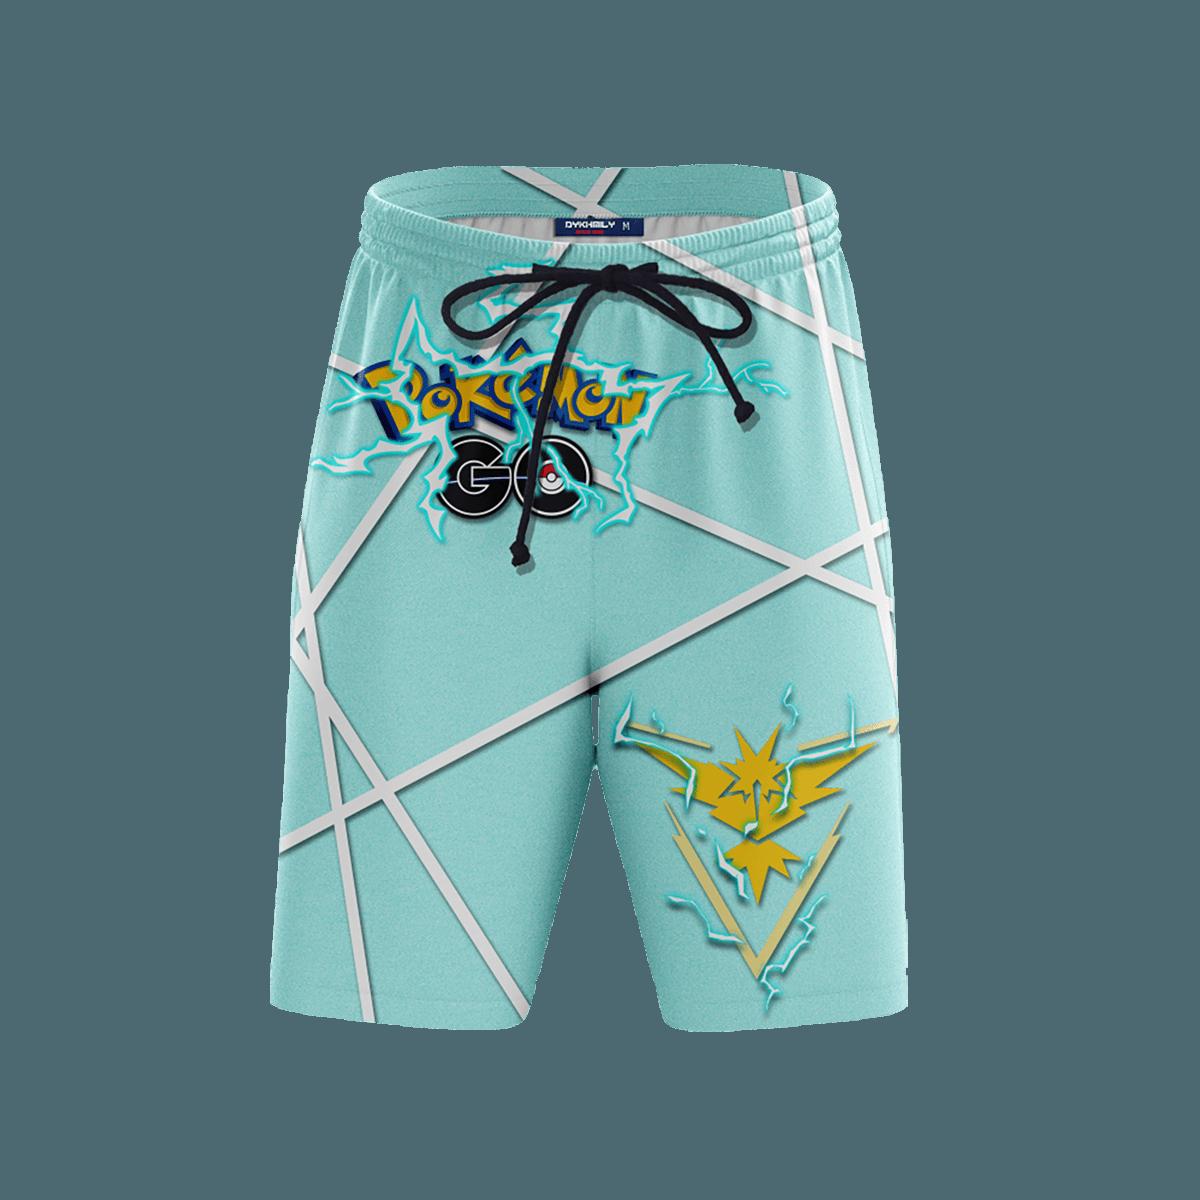 Team Instinct Beach Shorts FDM3107 S Official Anime Swimsuit Merch